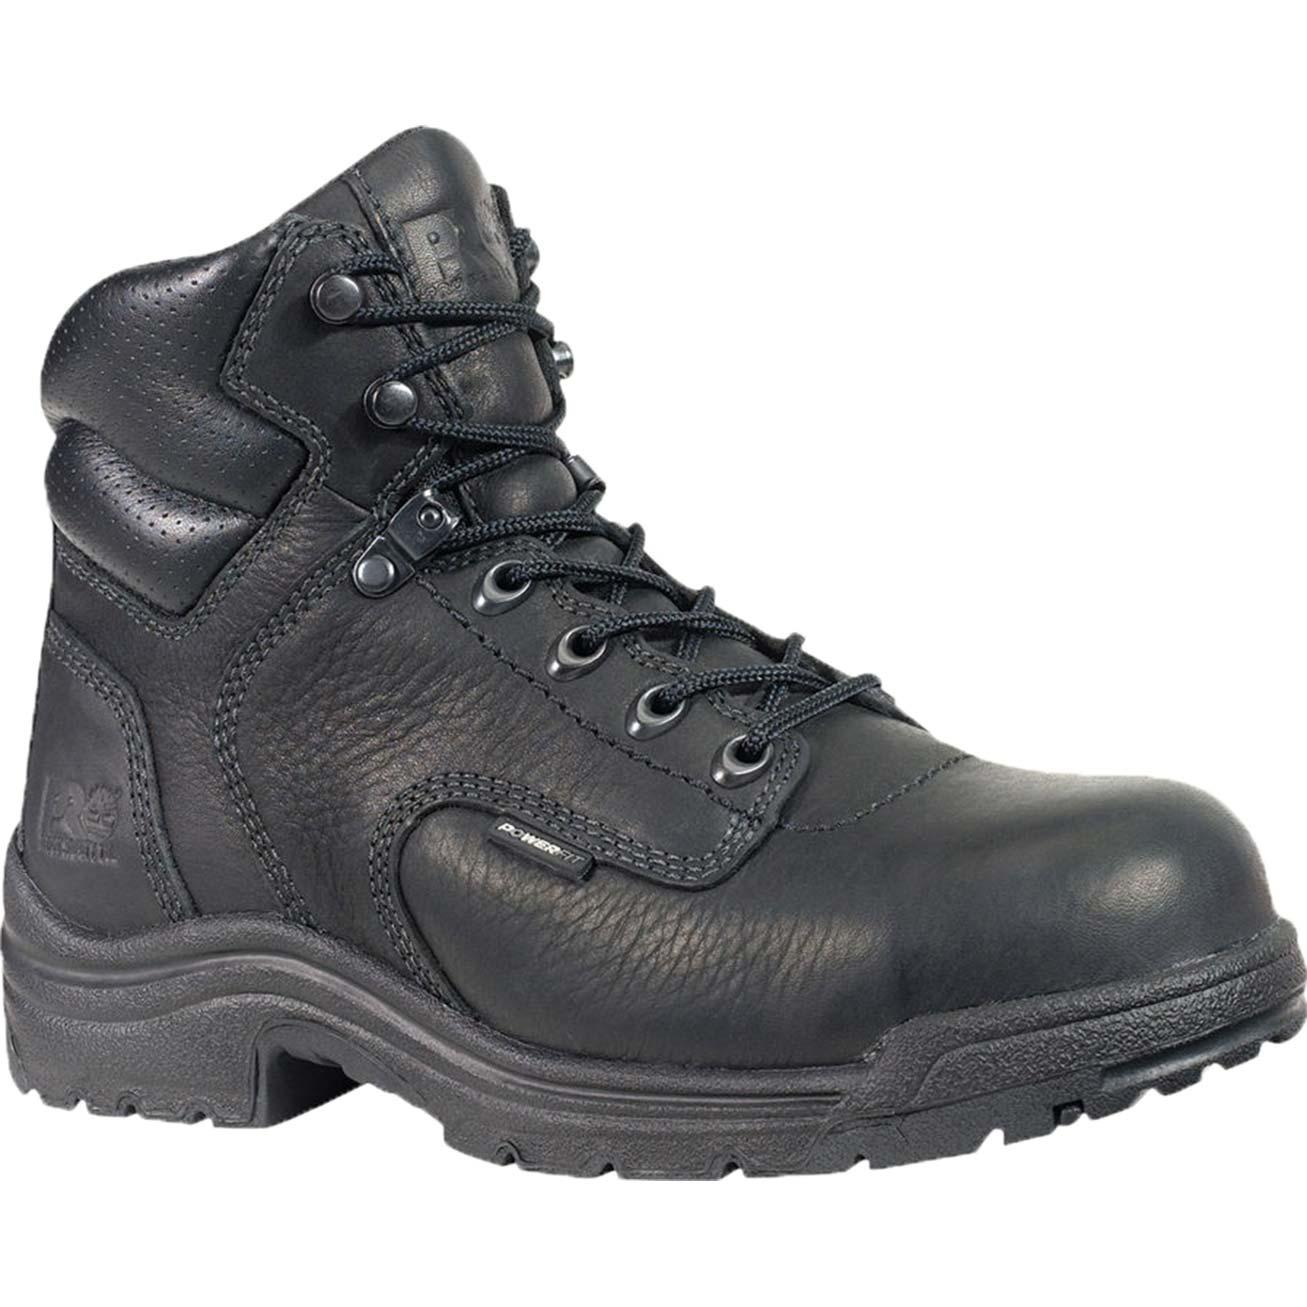 Timberland PRO TiTAN Women s Alloy Toe Work Boot 1517eea0e5